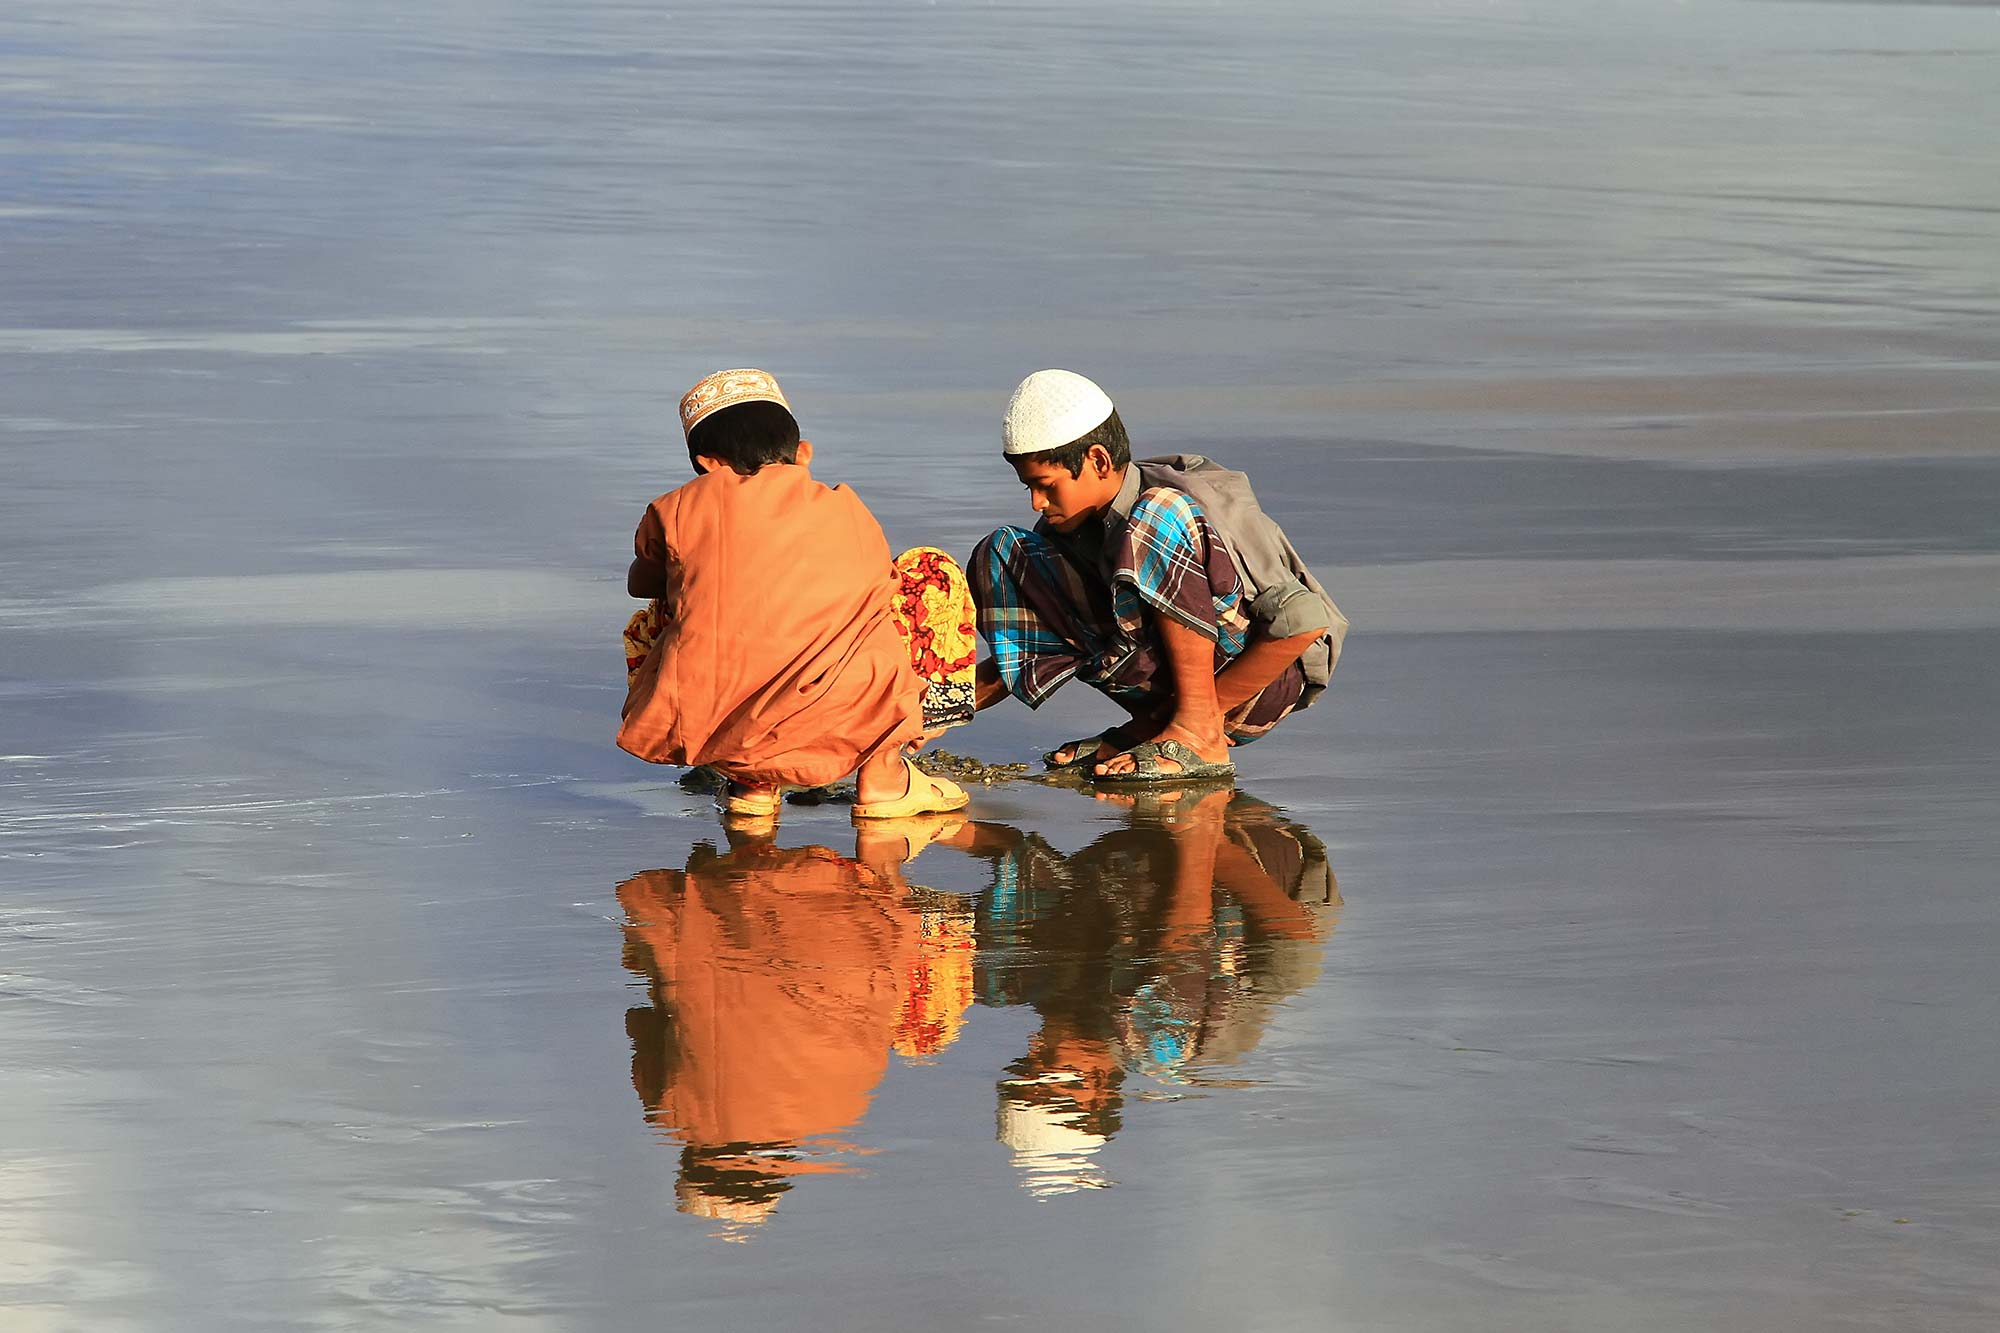 Reflections at Kuakata beach. © Ulli Maier & Nisa Maier